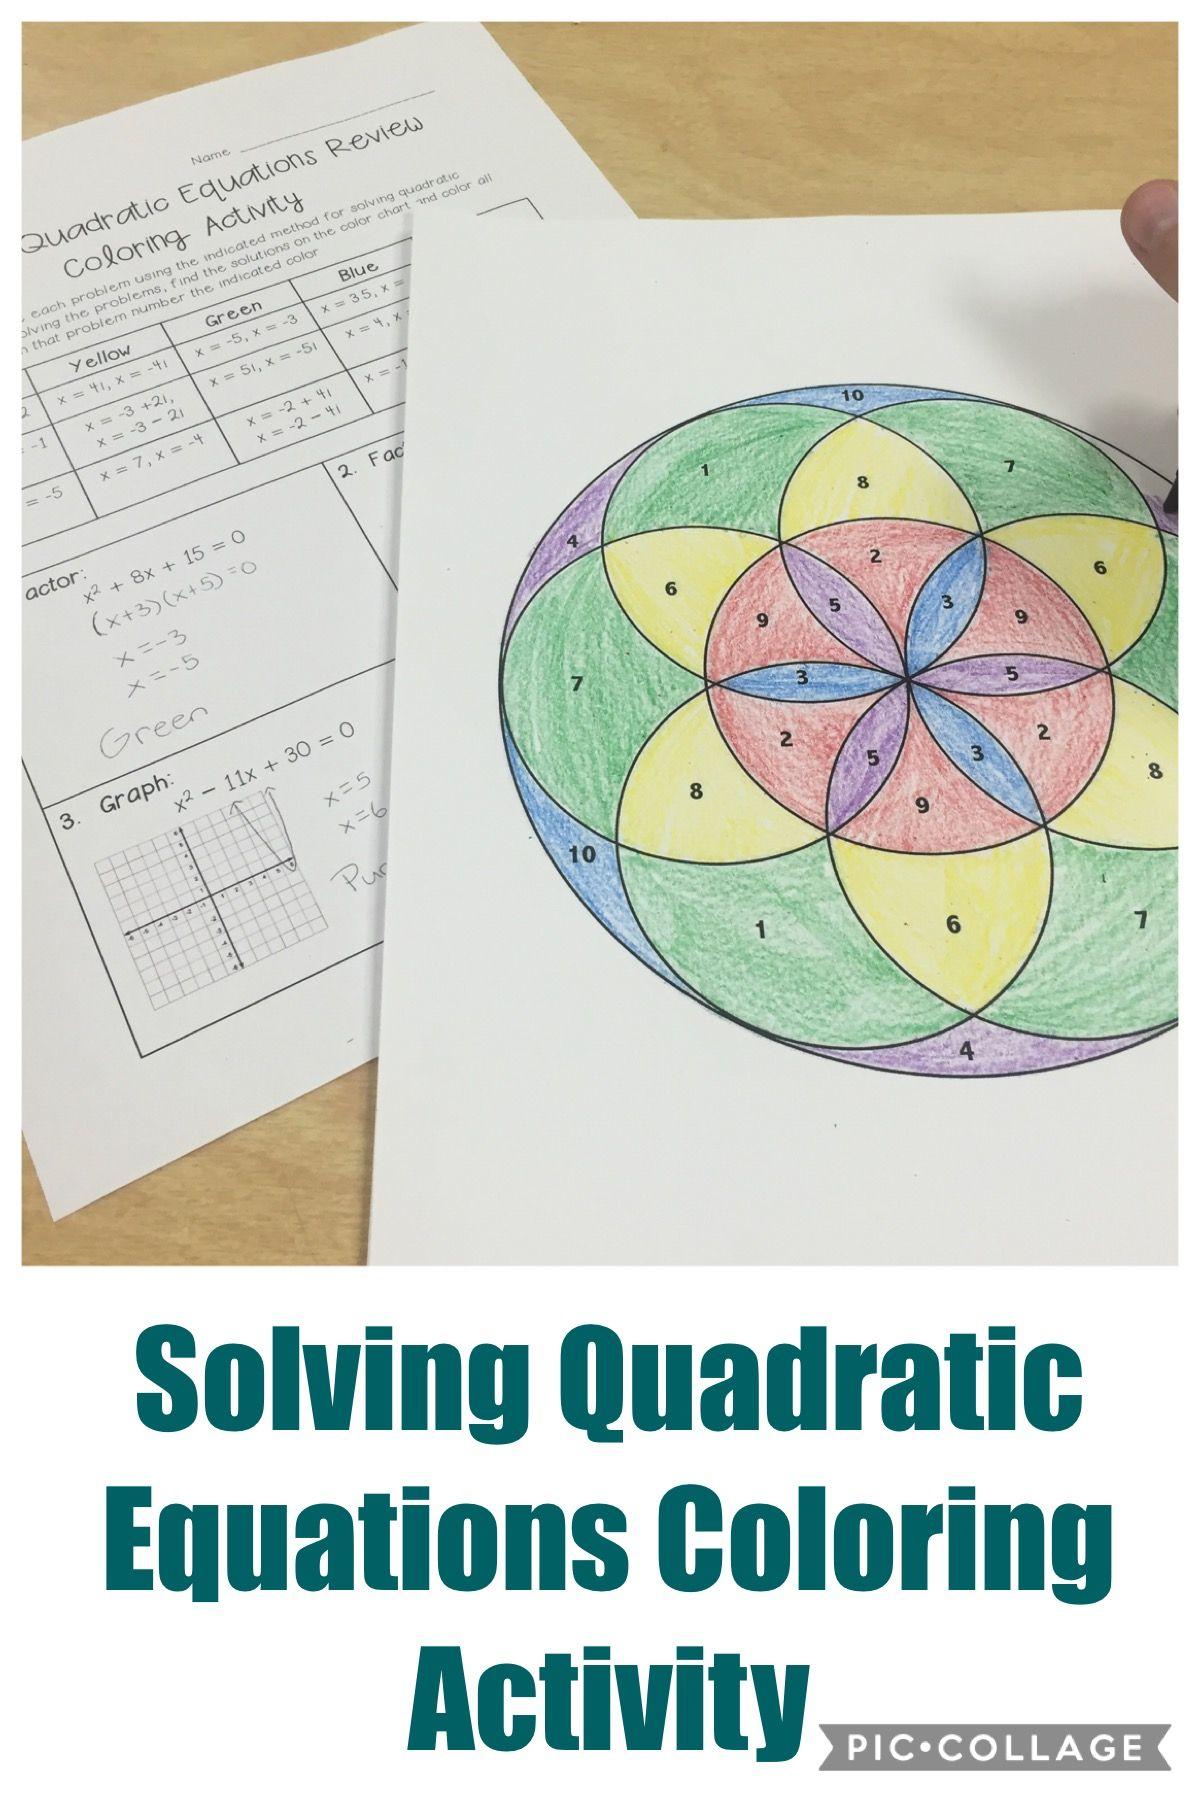 Solving Quadratic Equations Review Coloring Activity